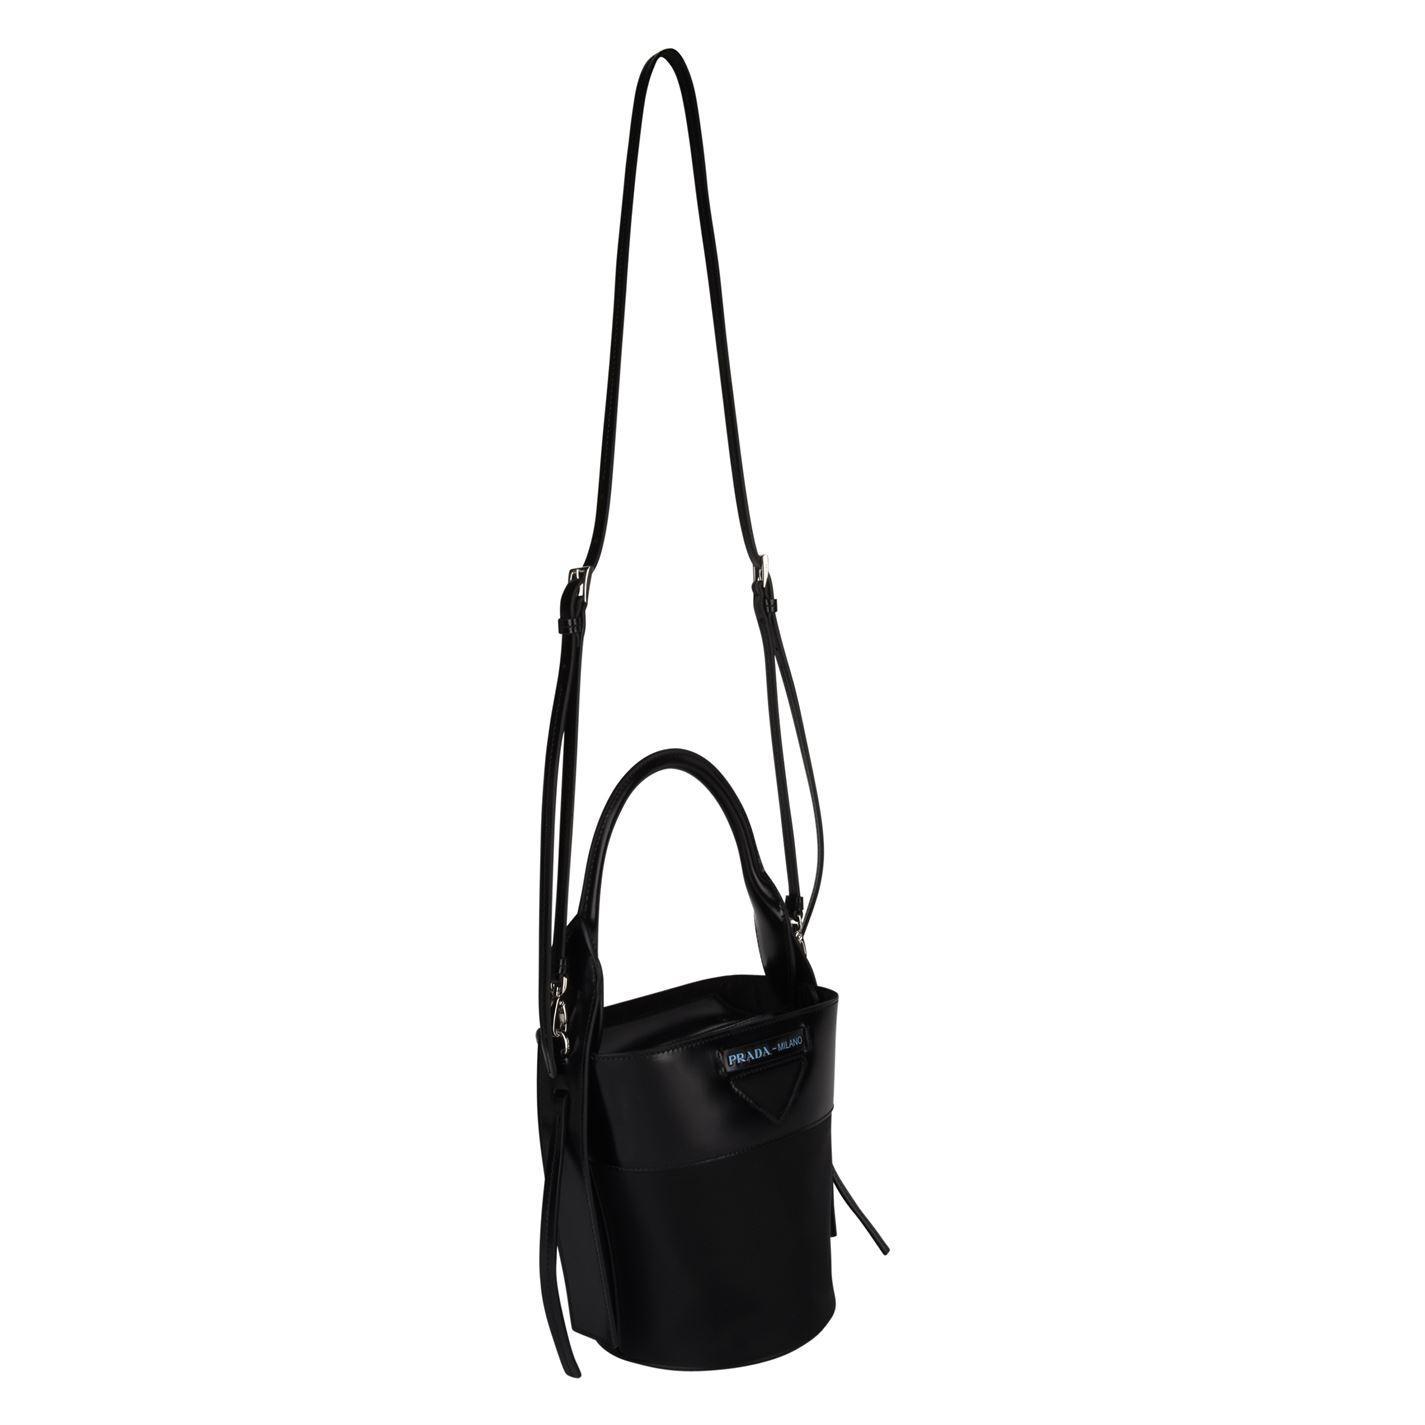 b32870077d Prada Ouverture Nylon Bucket Bag in Black - Lyst